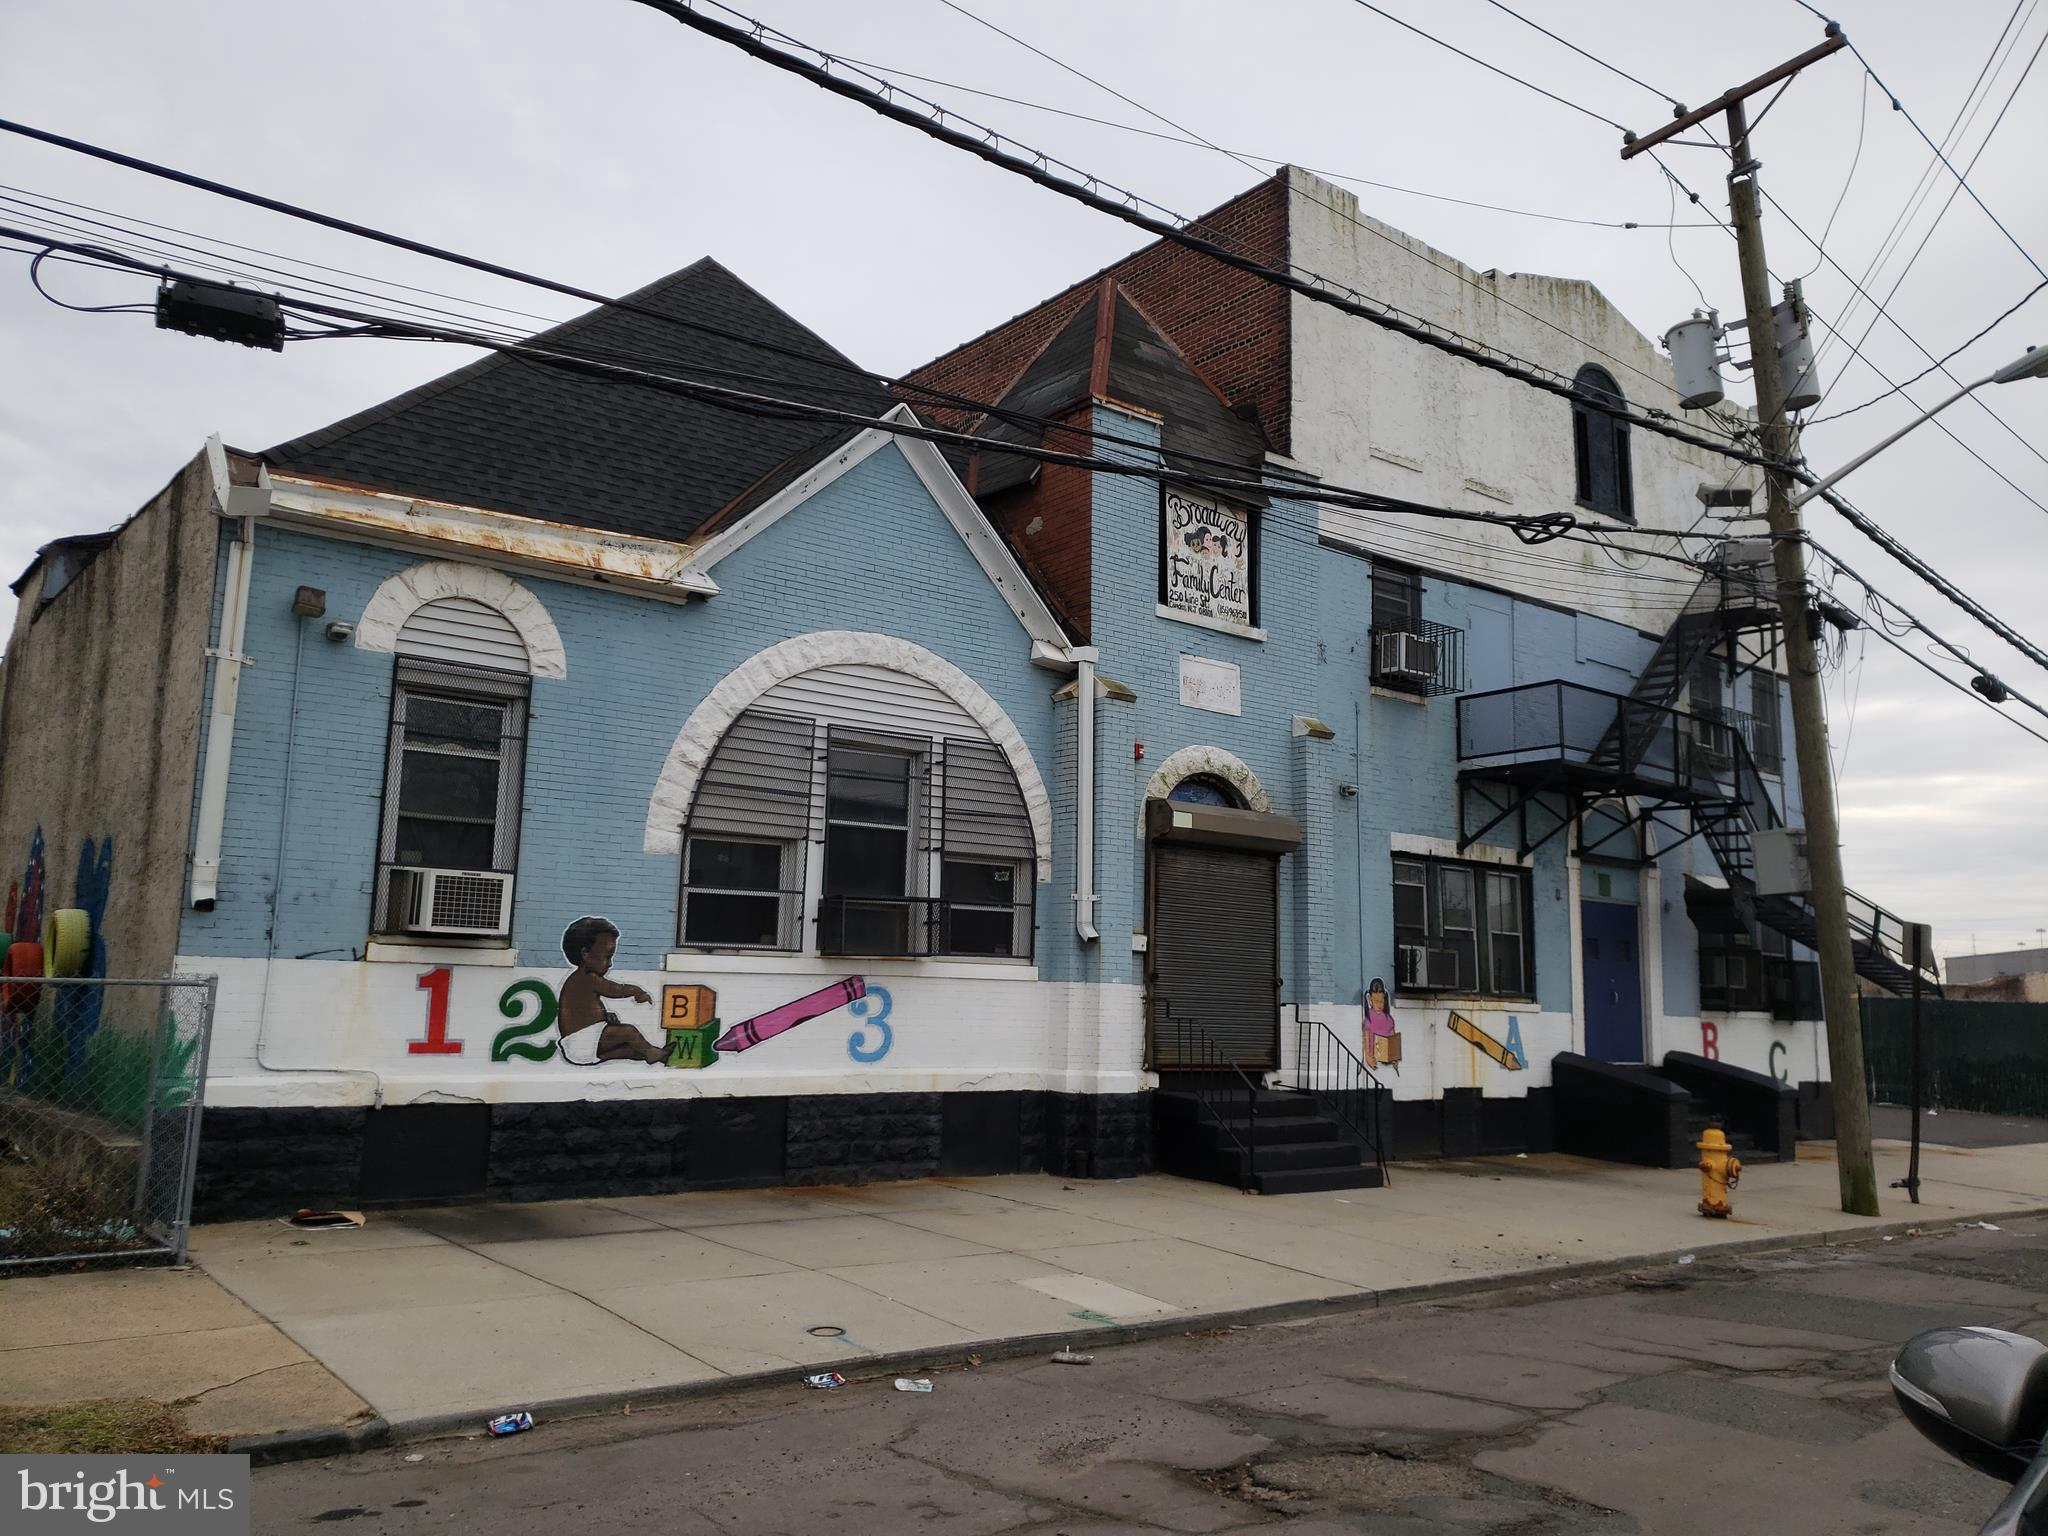 246 LINE STREET, CAMDEN, NJ 08103